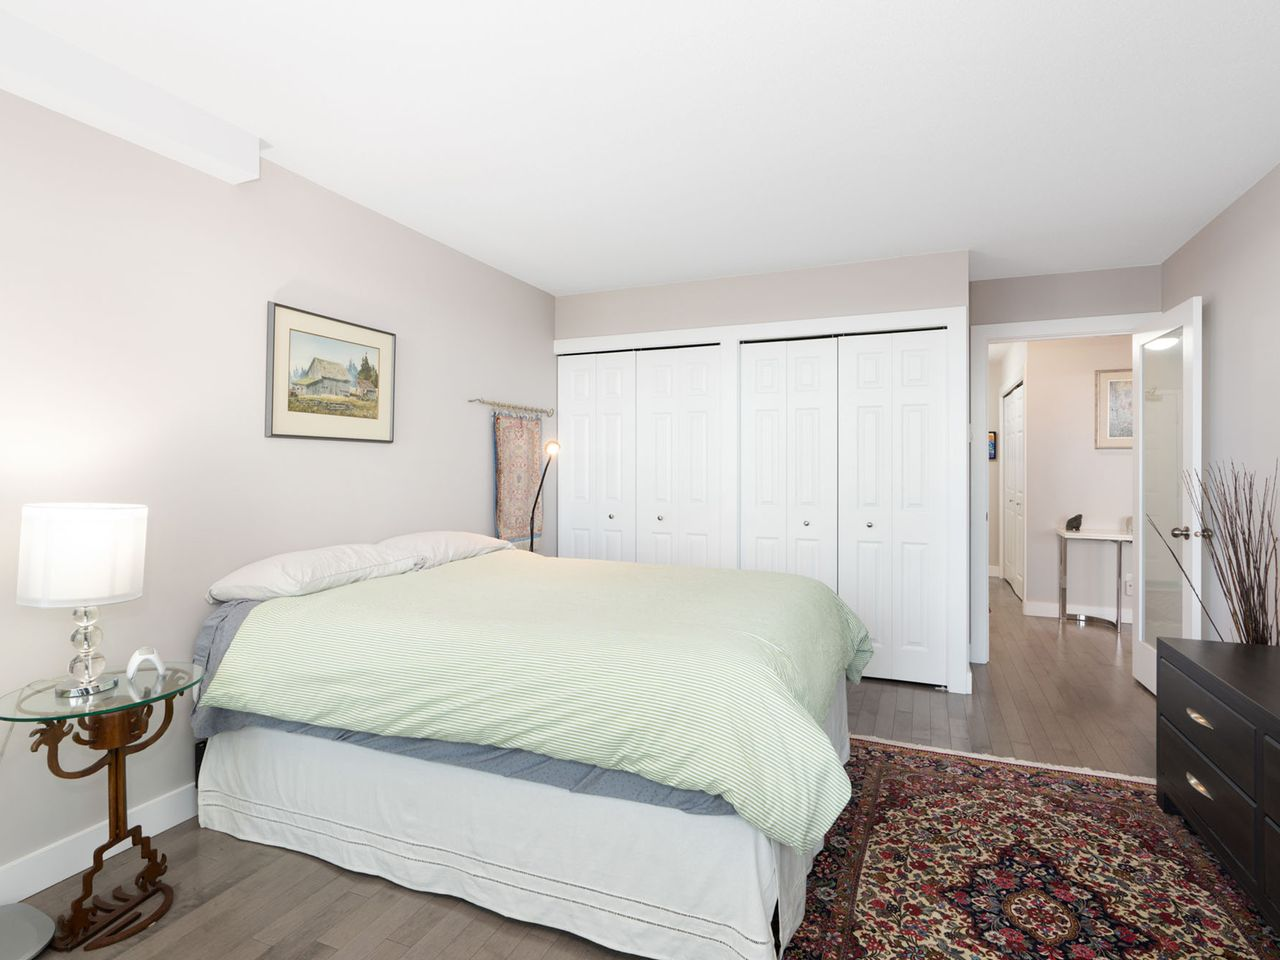 807-4160-albert-st_gavin-4572 at 807 - 4160 Albert Street, Vancouver Heights, Burnaby North